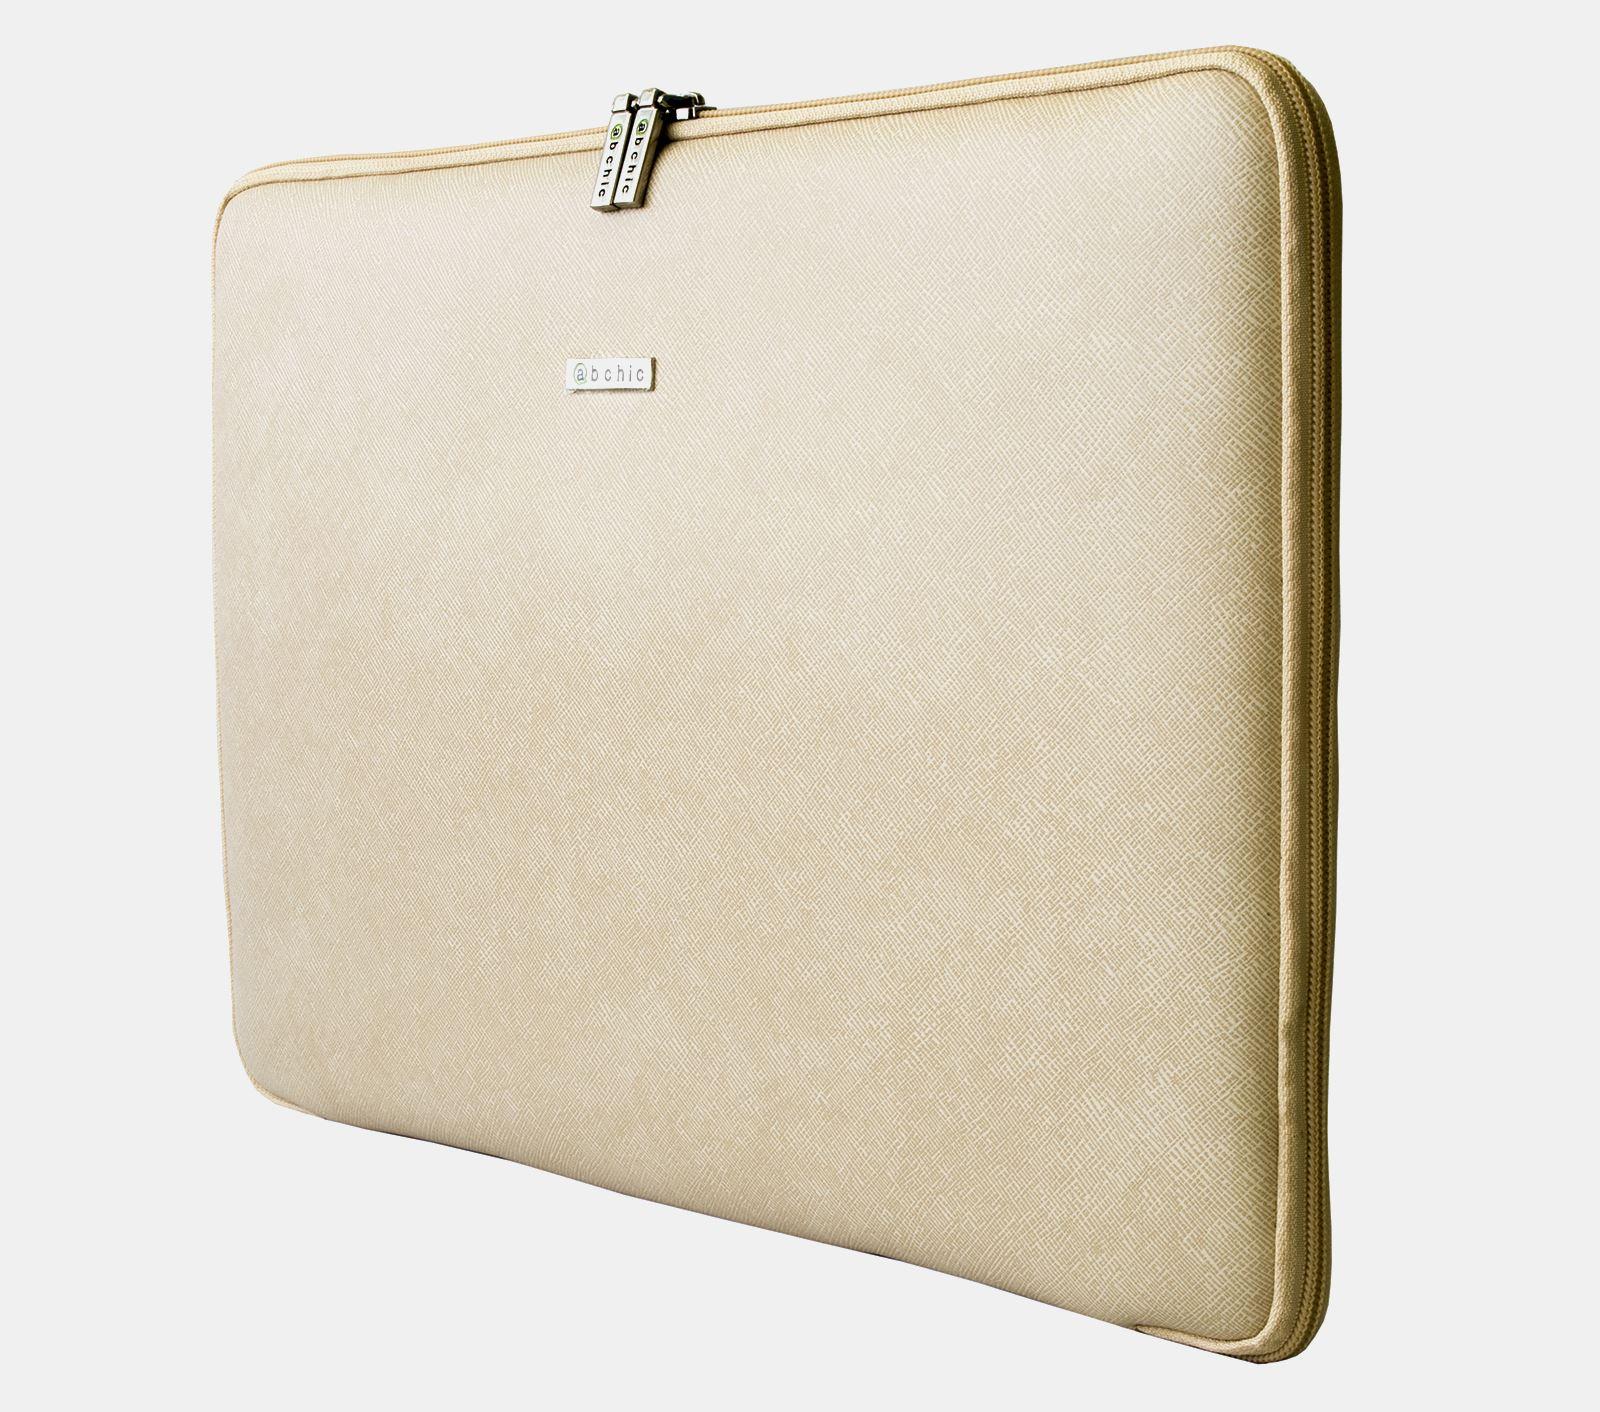 abchic abbi designer laptop bag woman handbag for laptop and macbook air pro. Black Bedroom Furniture Sets. Home Design Ideas